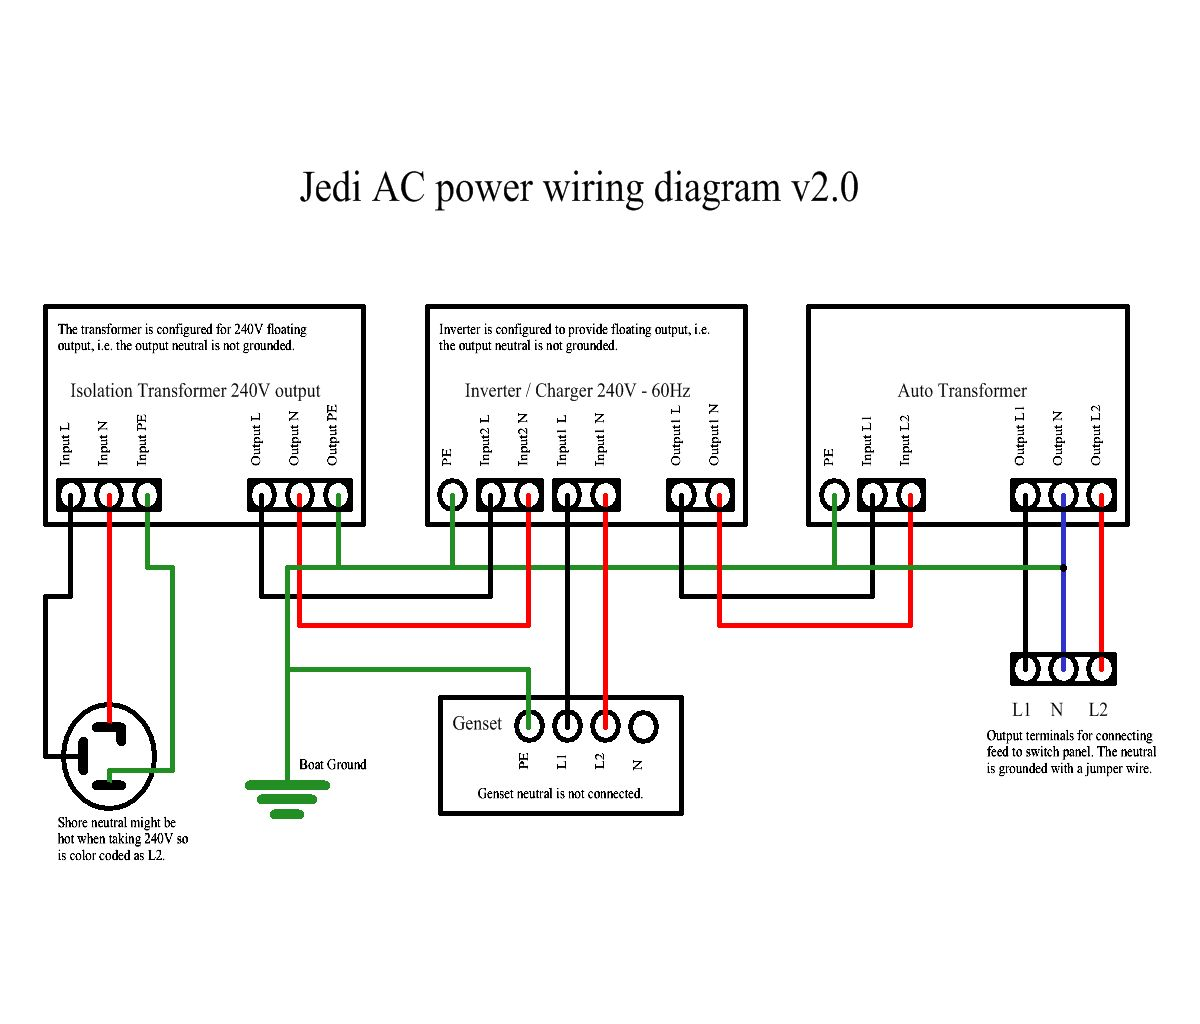 rib boat wiring diagram rib wiring diagrams online standard boat wiring diagram standard wiring diagrams